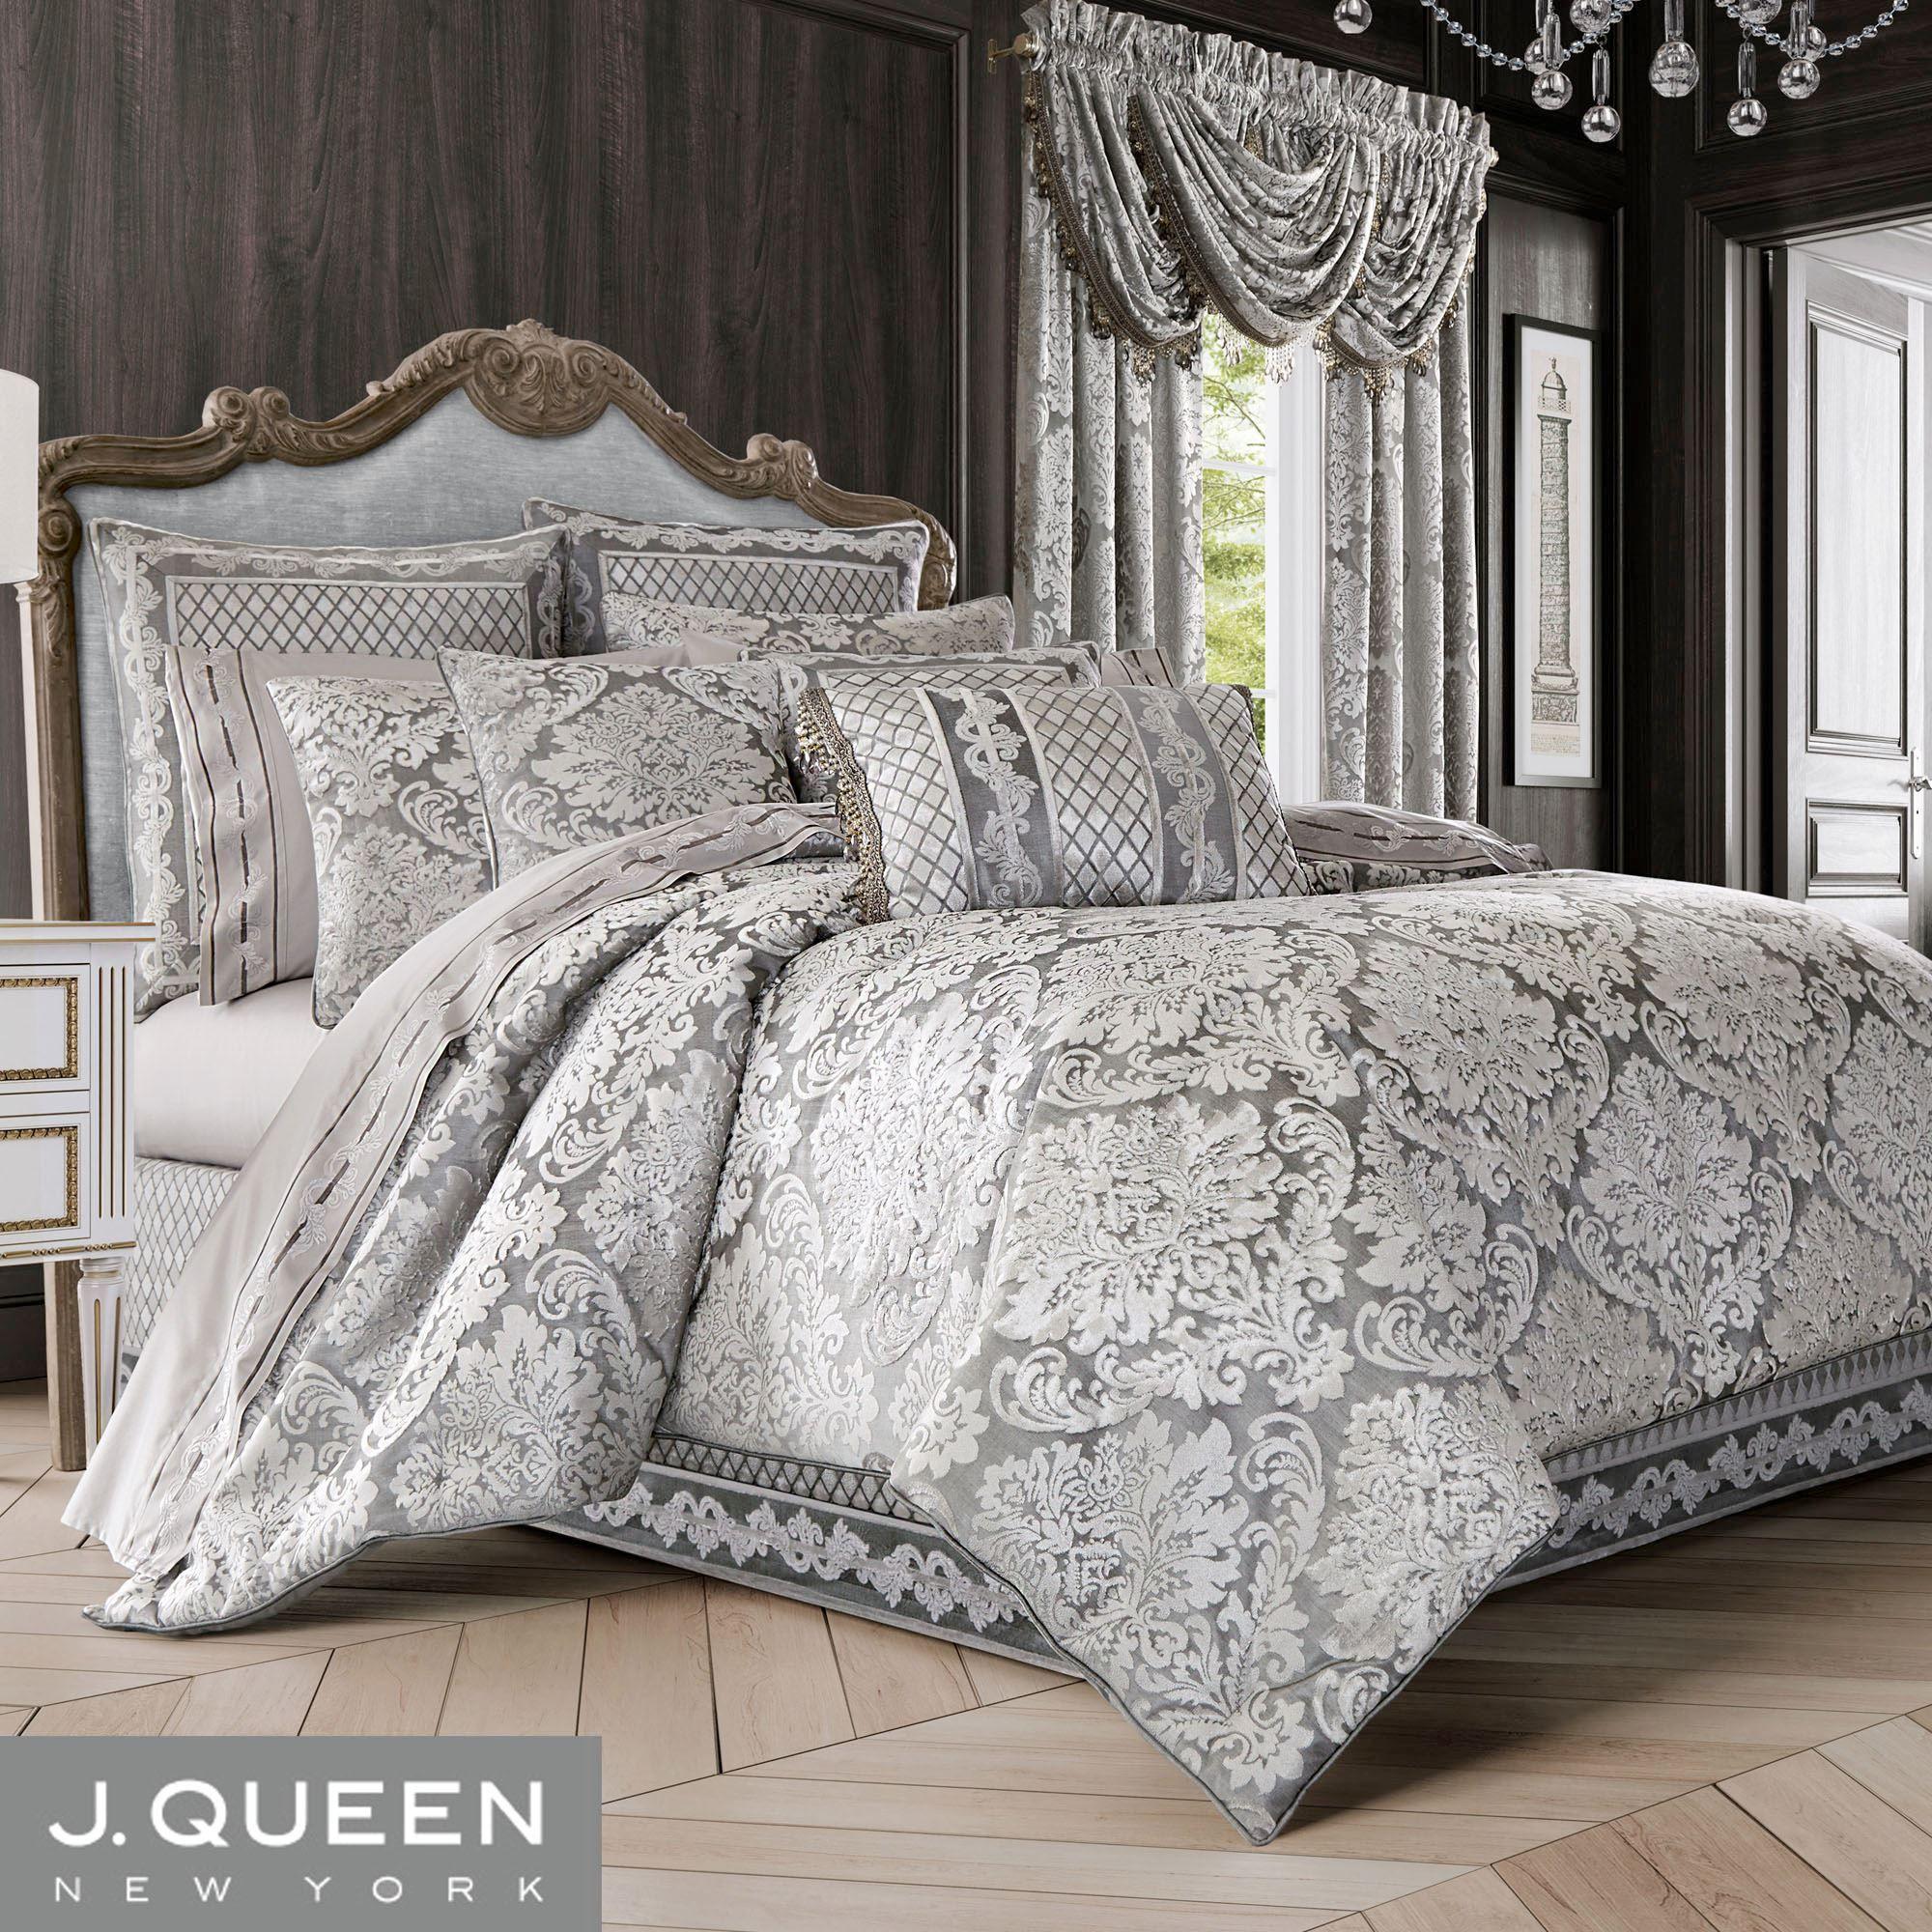 medallion set new comforter p silver sicily j york bedding gray by queen